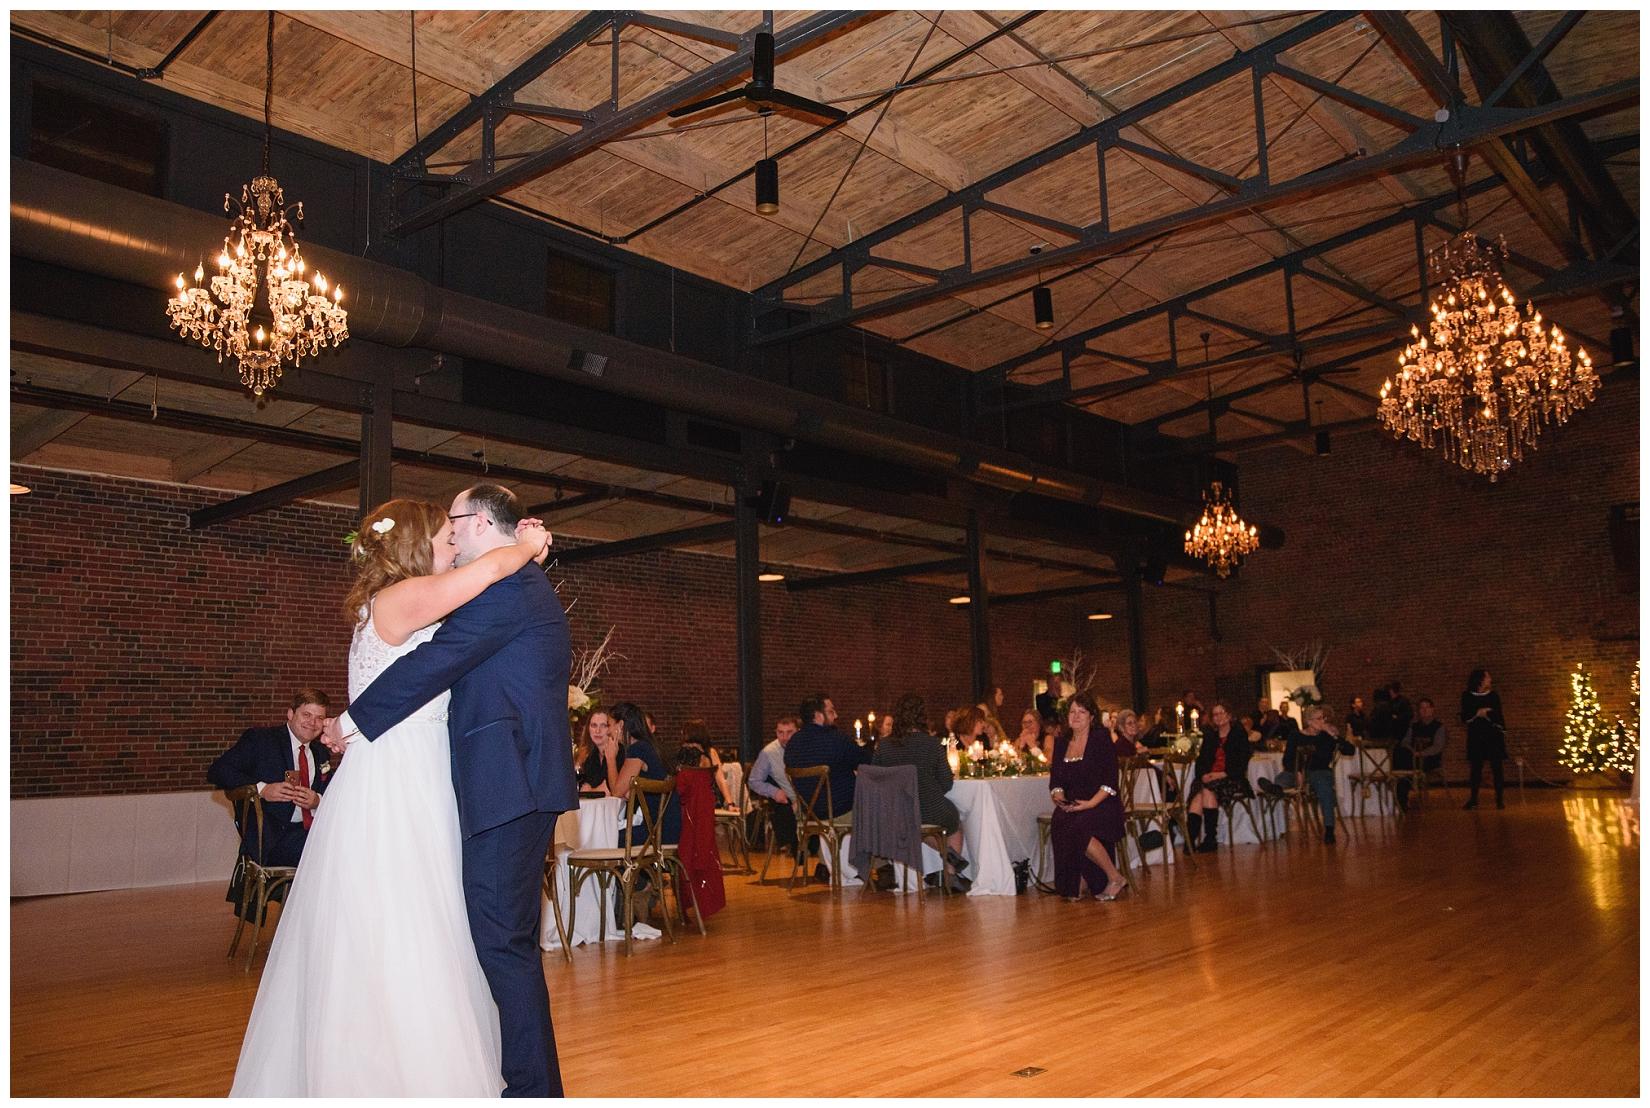 cat-alkire-wedding-photographer-indiana-chicago-indianapolis-fort-wayne_0998.jpg